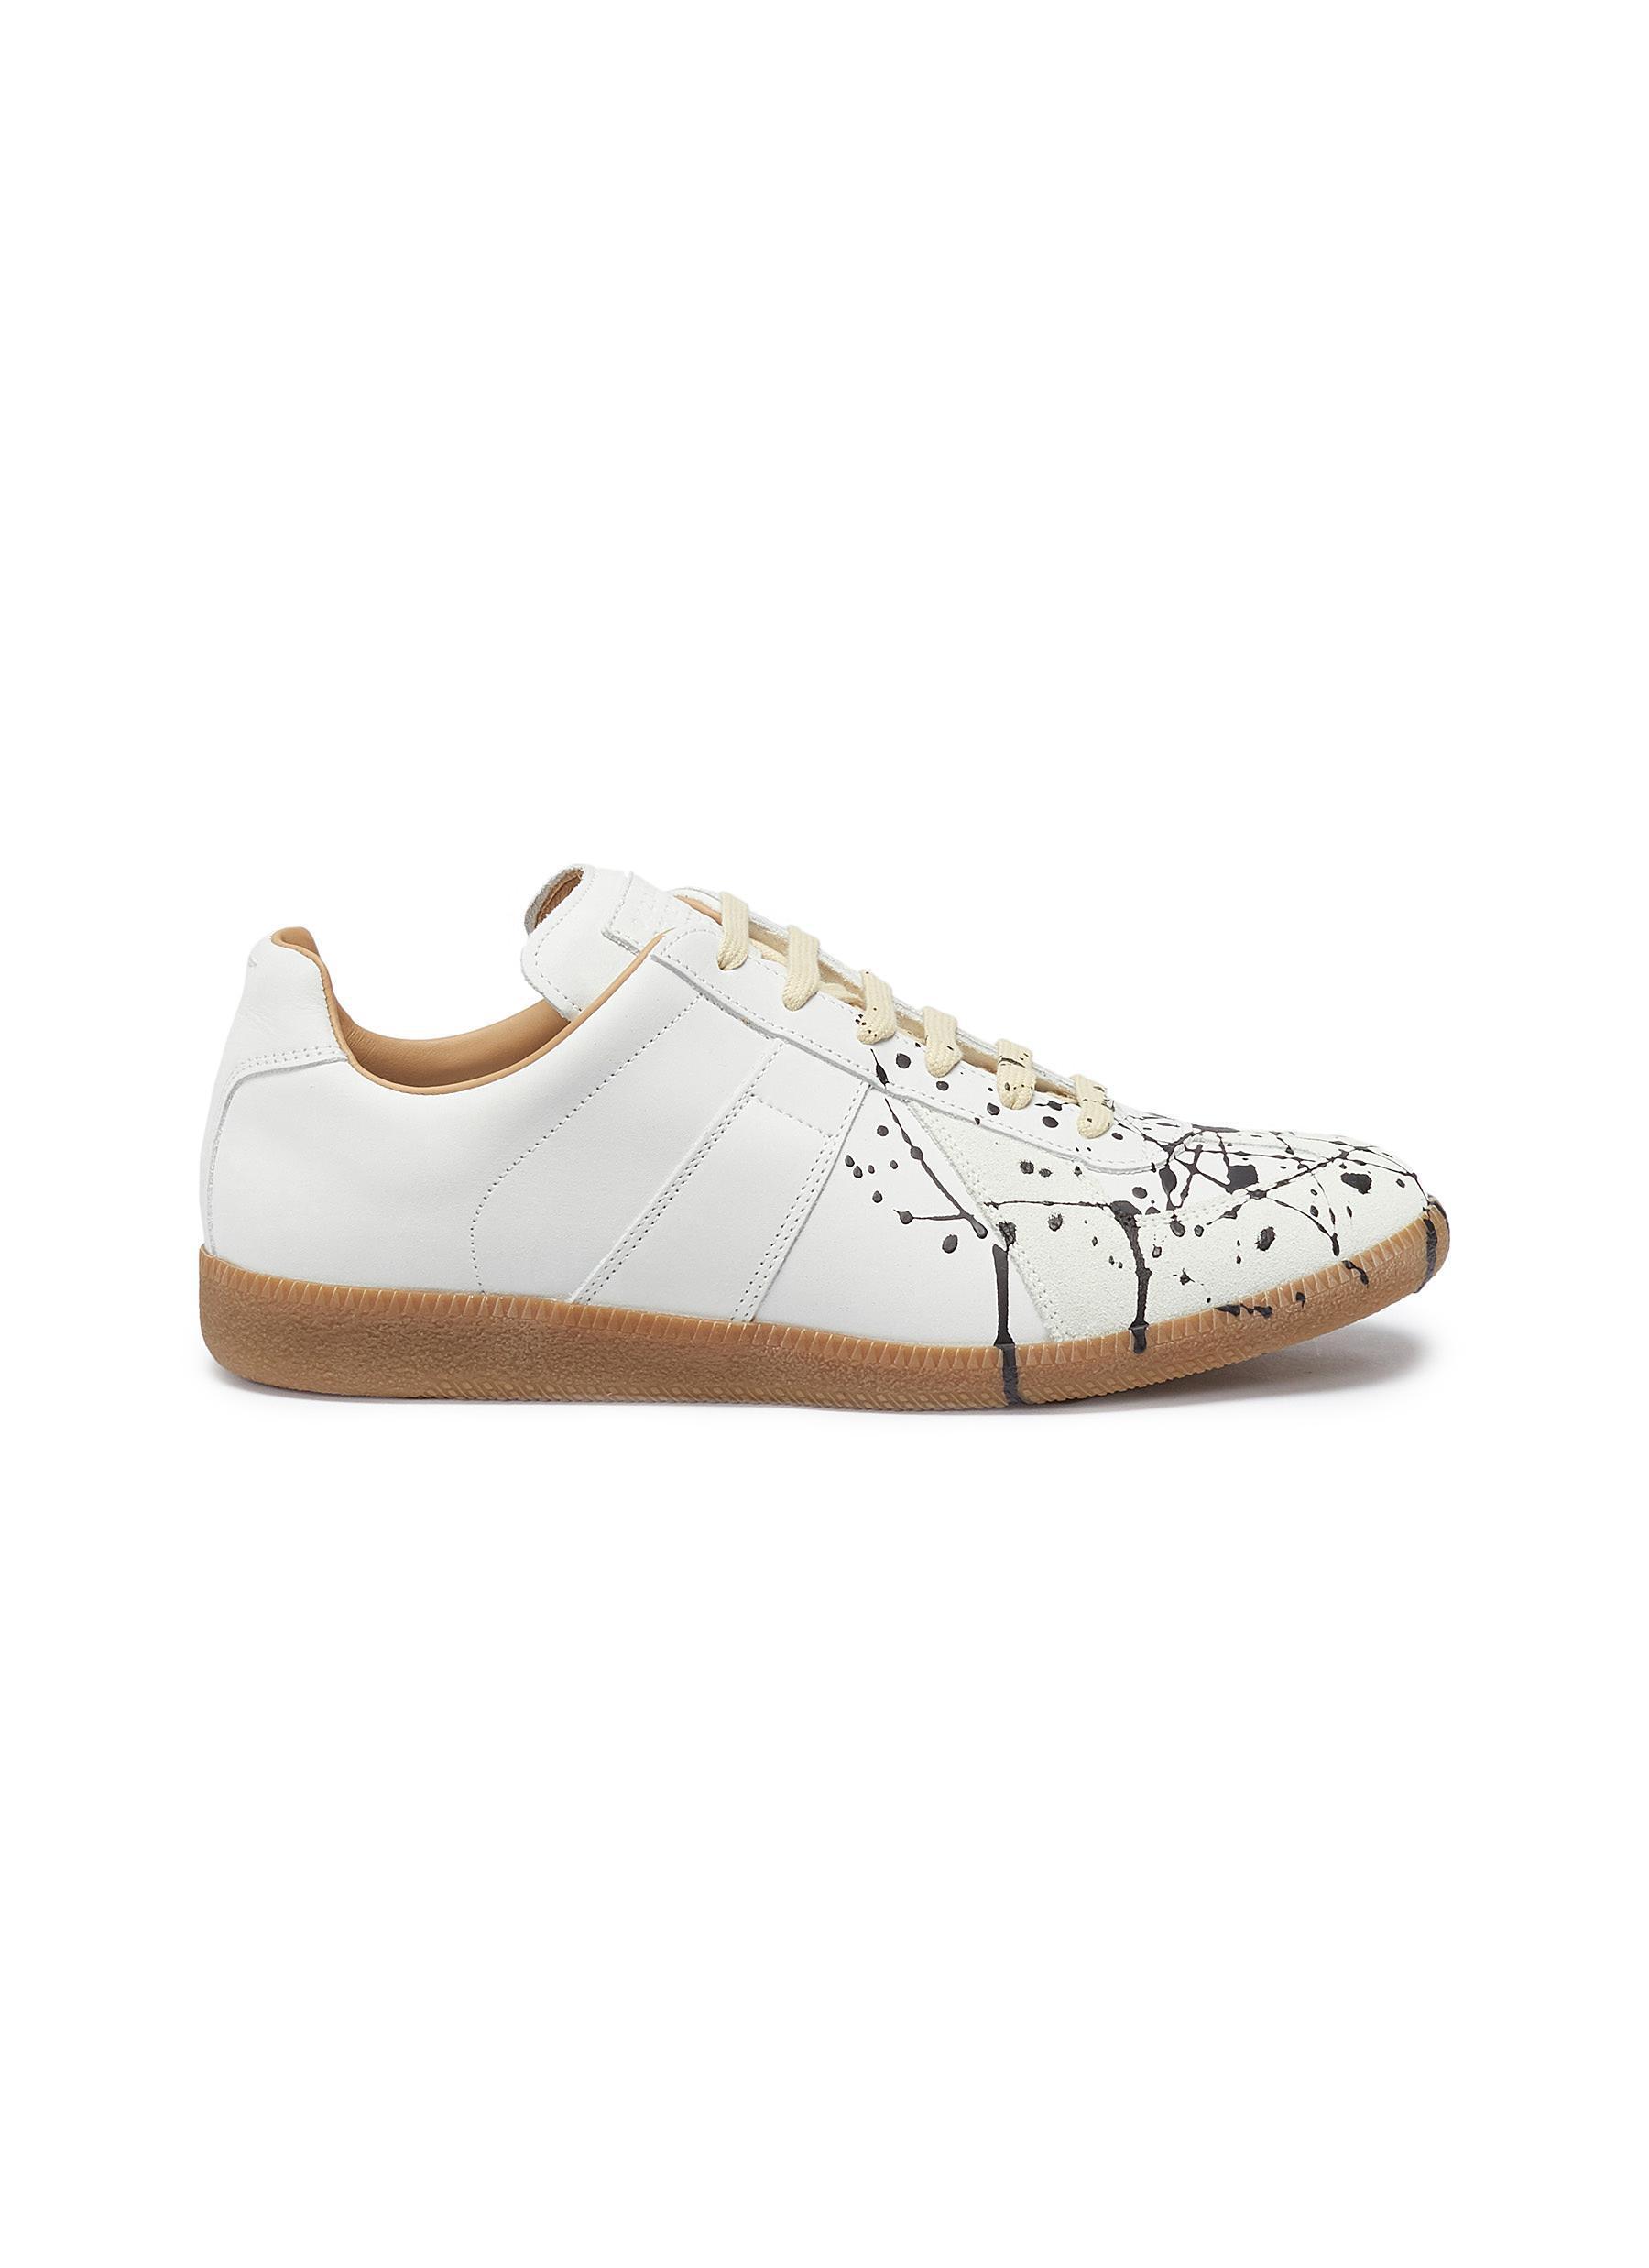 a852417ede0d Lyst - Maison Margiela  replica  Paint Splatter Leather Sneakers for Men